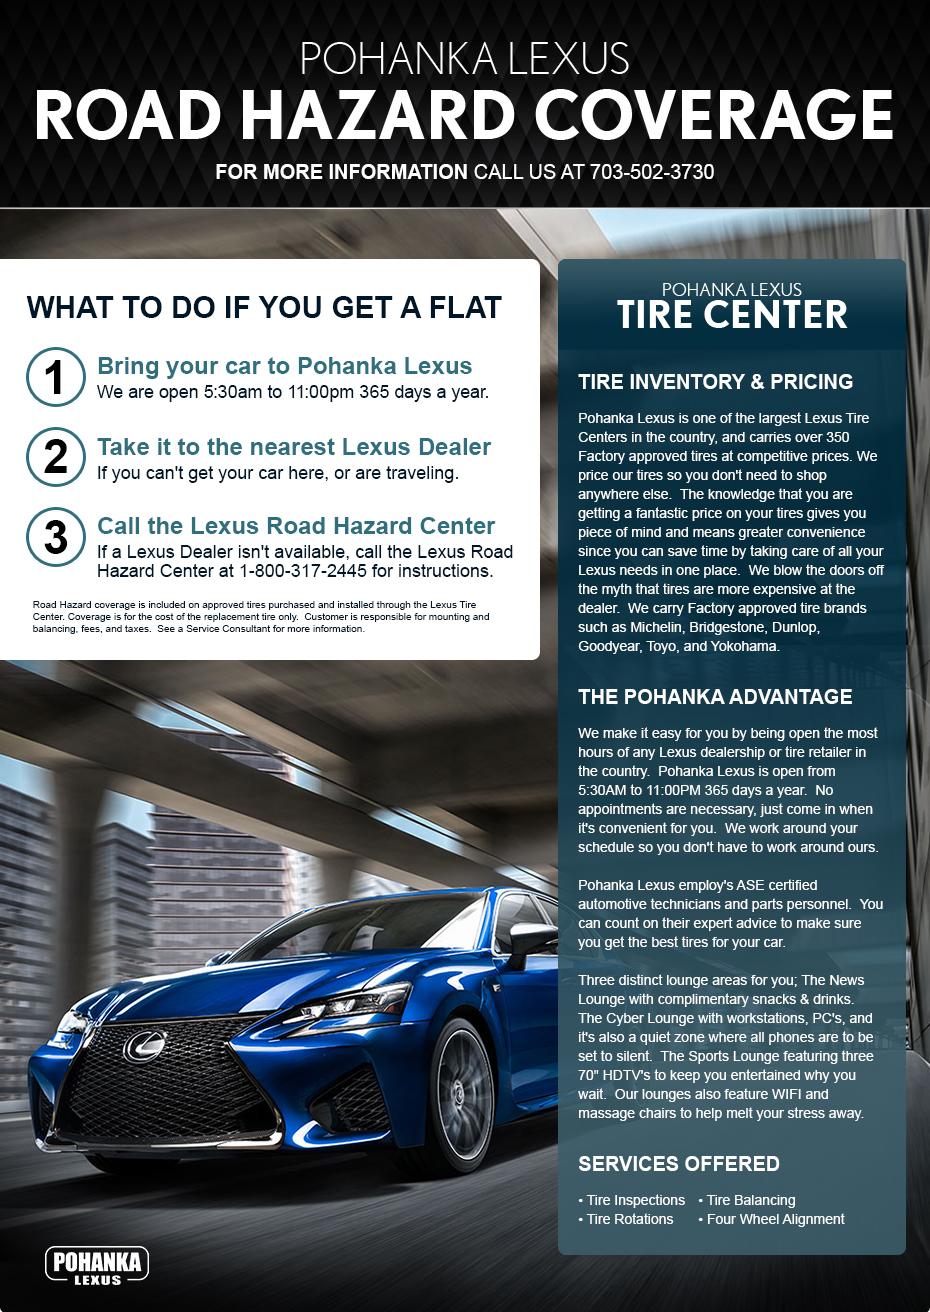 Tire Center Pohanka Lexus